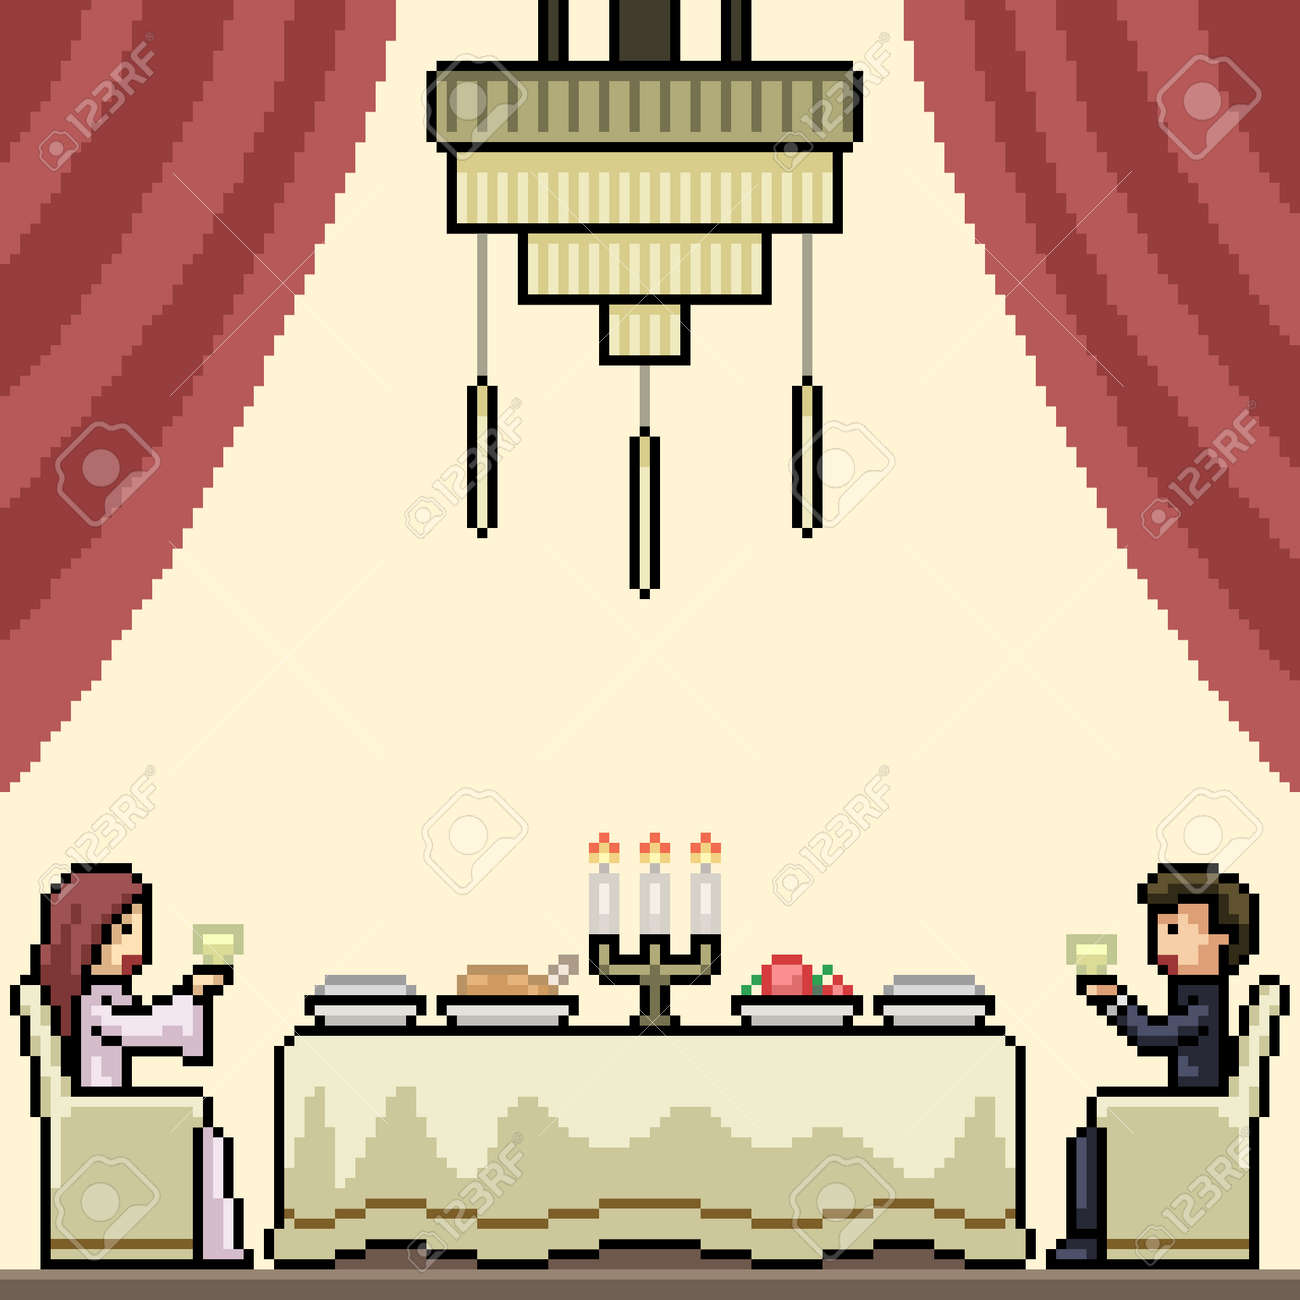 pixel art of luxury couple dinner - 169836179